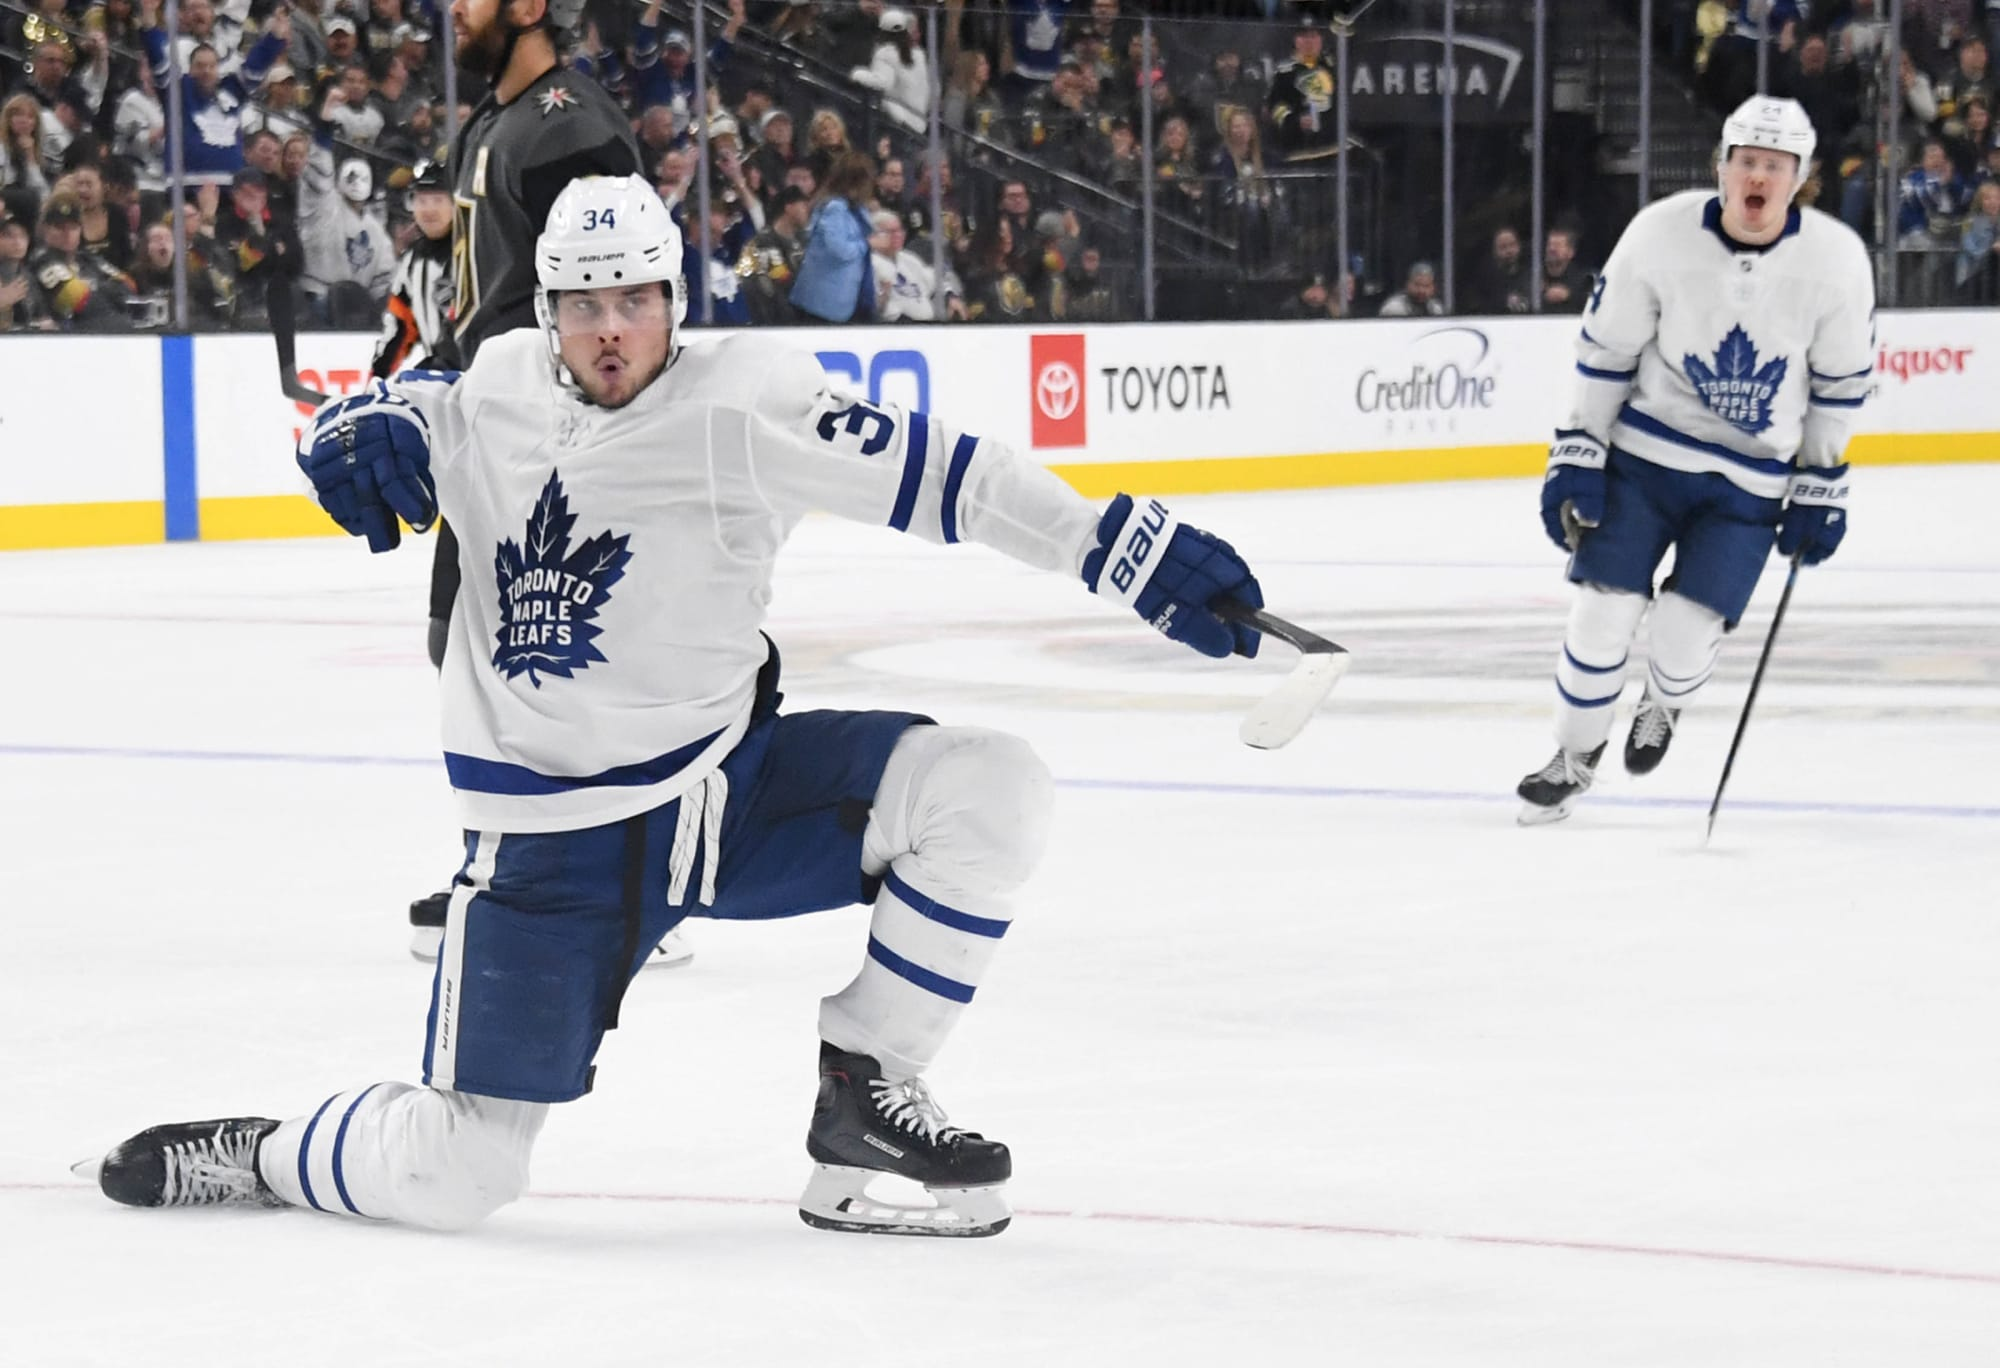 Toronto Maple Leafs: Can Auston Matthews Set Goal Scoring Record?